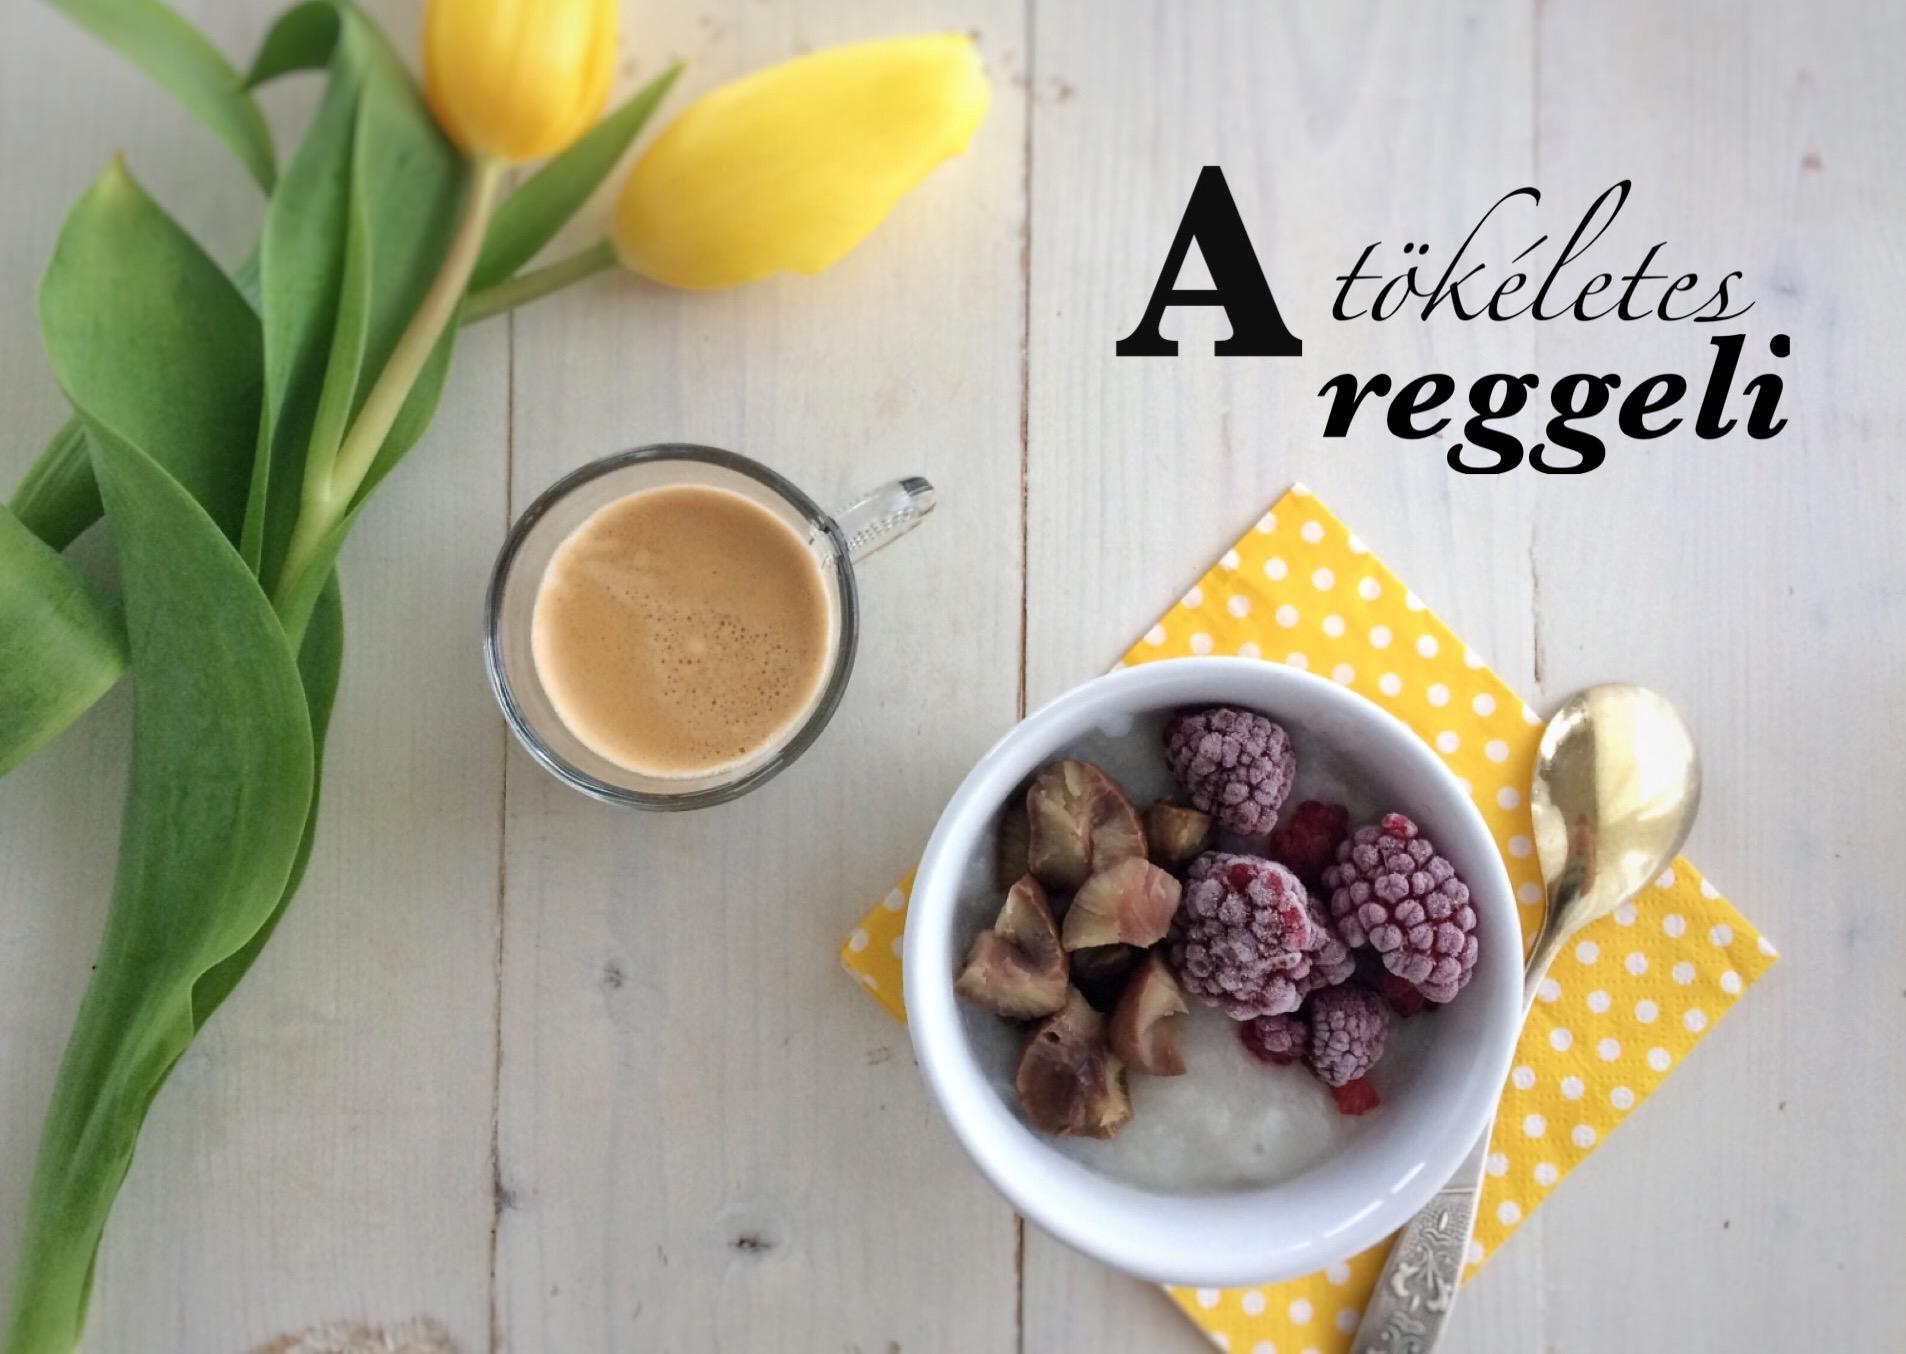 a-tokoletes-reggeli-cover.jpg